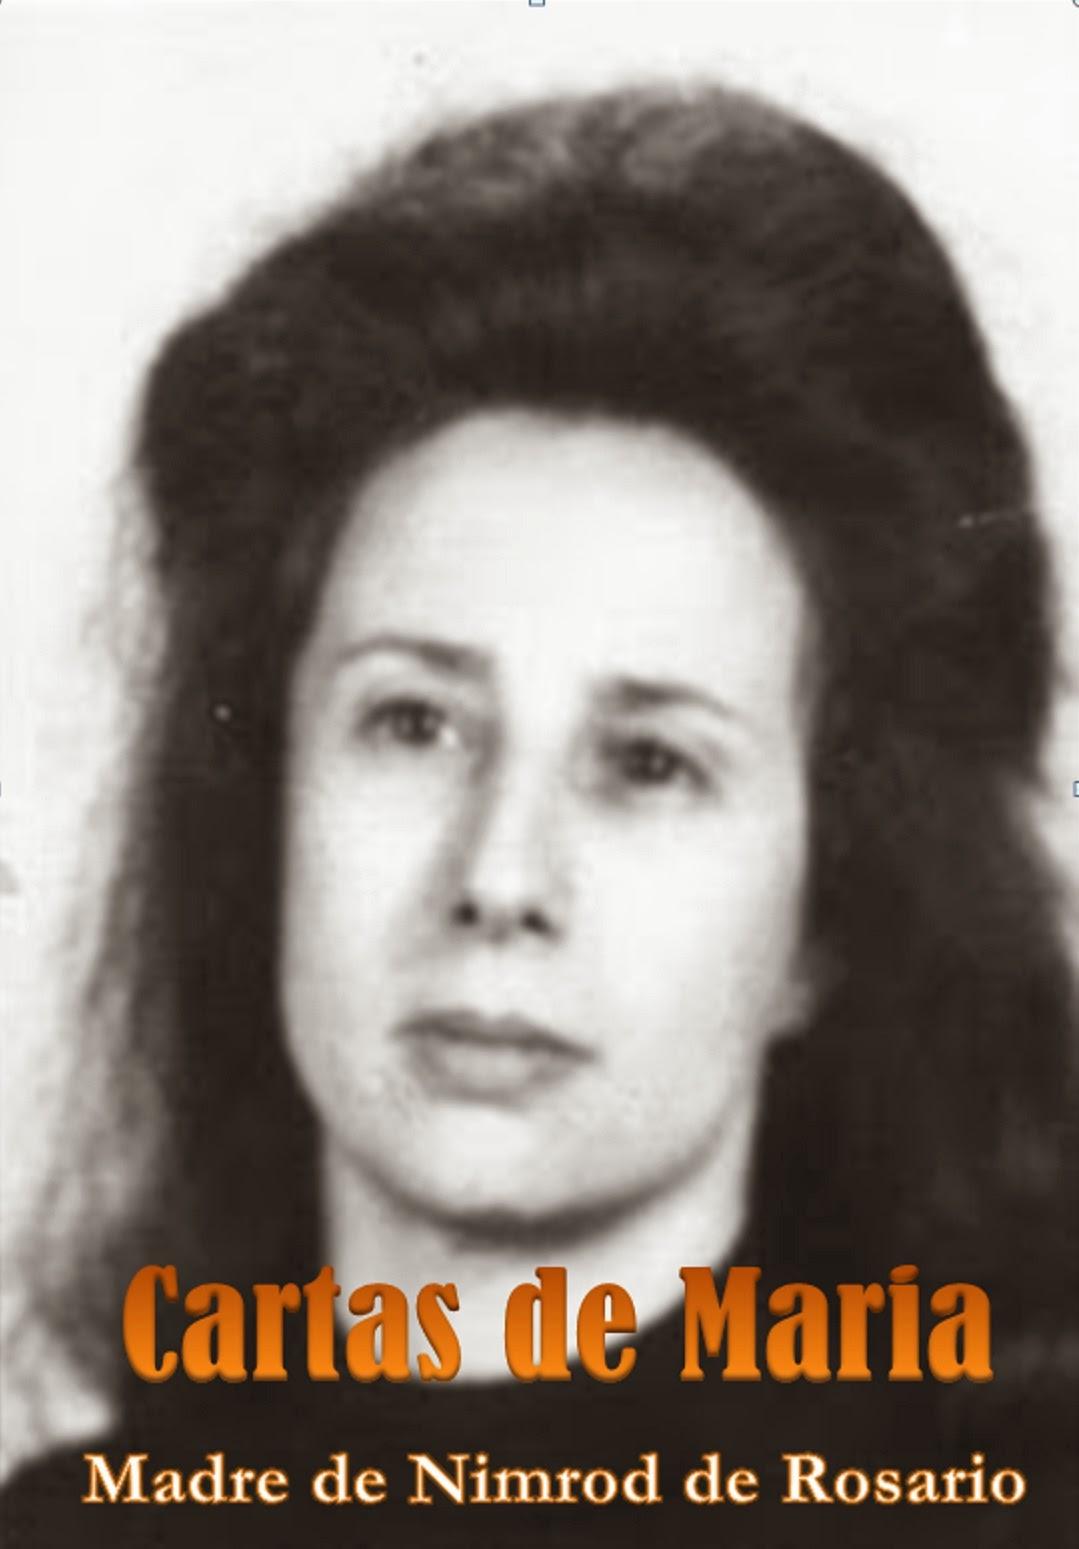 http://es.scribd.com/doc/212070684/Cartas-de-Maria-Edicion-Especial#logout